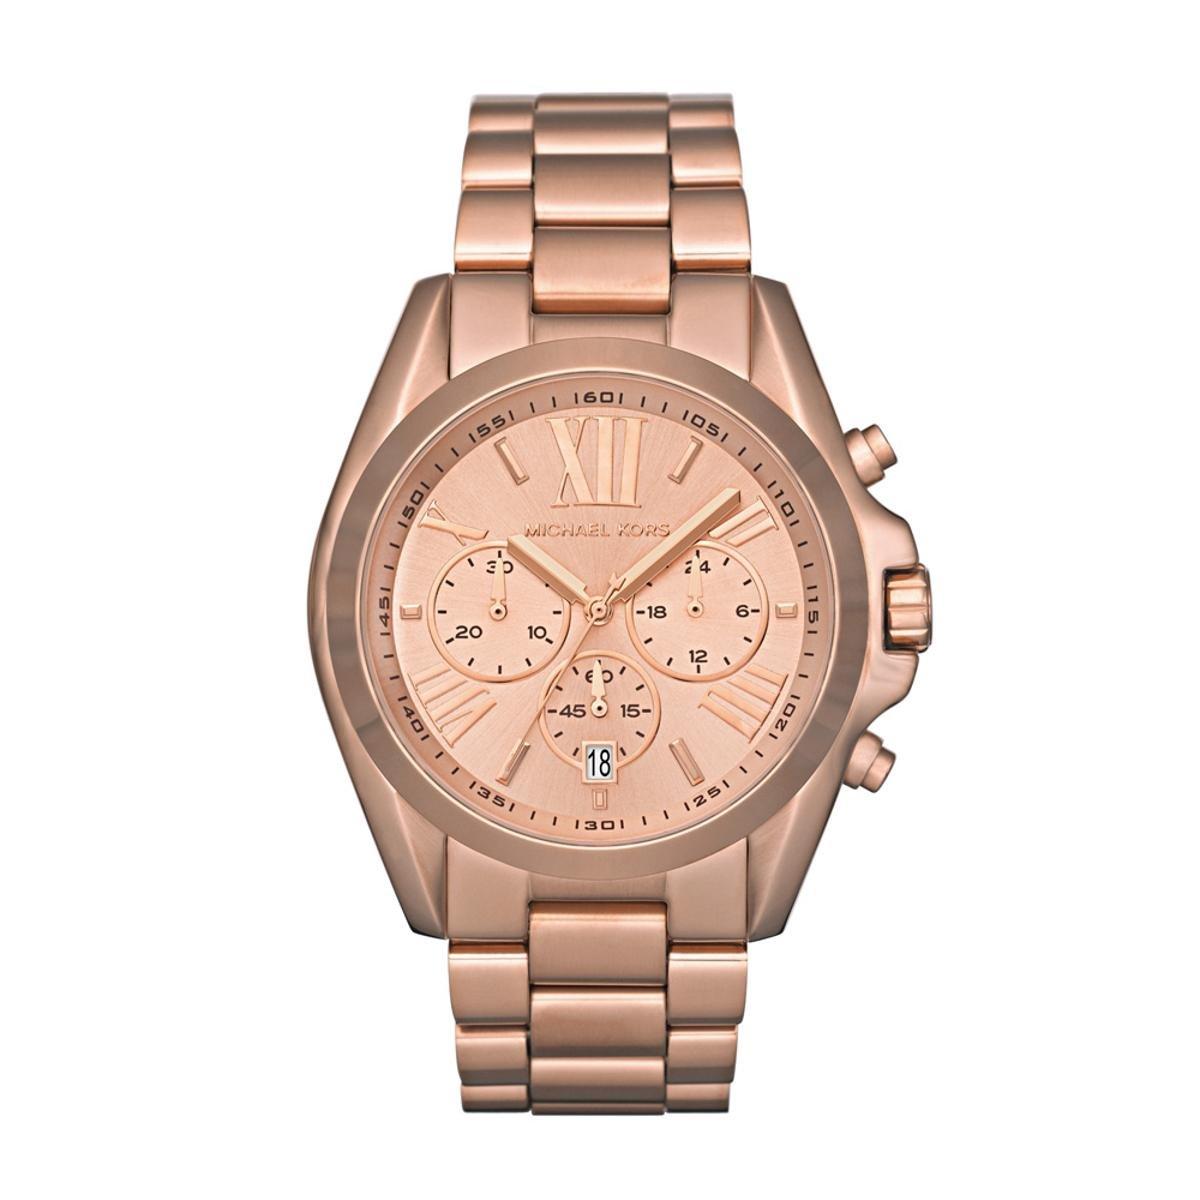 8d4341b102cd9 Relógio Michael Kors Feminino OMK5503 Z OMK5503 Z - Compre Agora ...